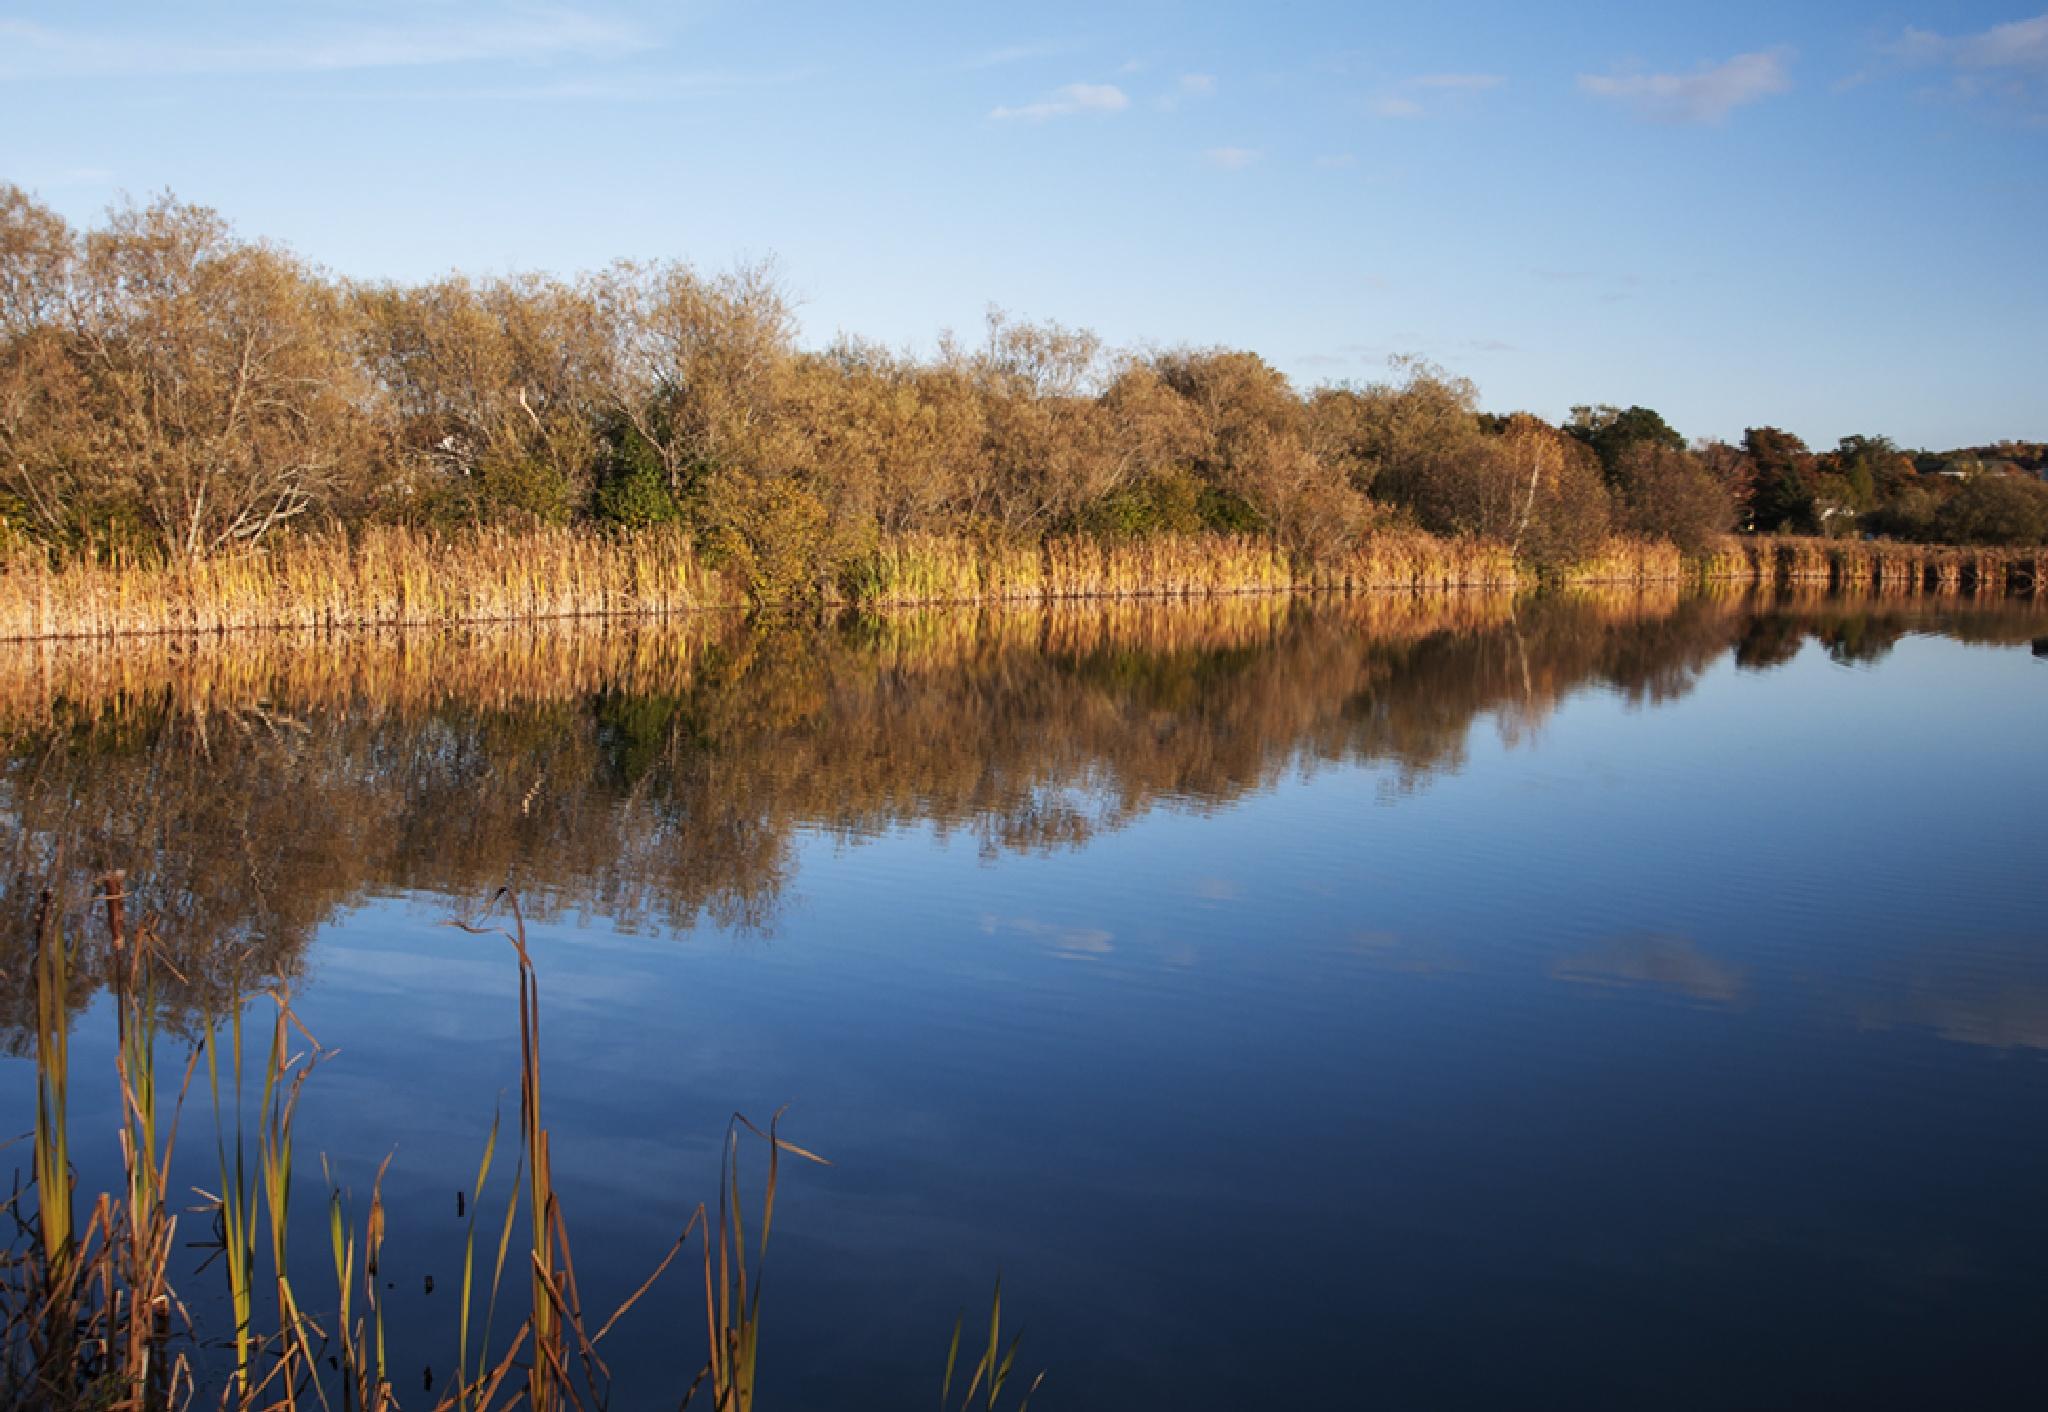 Sunlight on the Pond 2 by Wayne L. Talbot